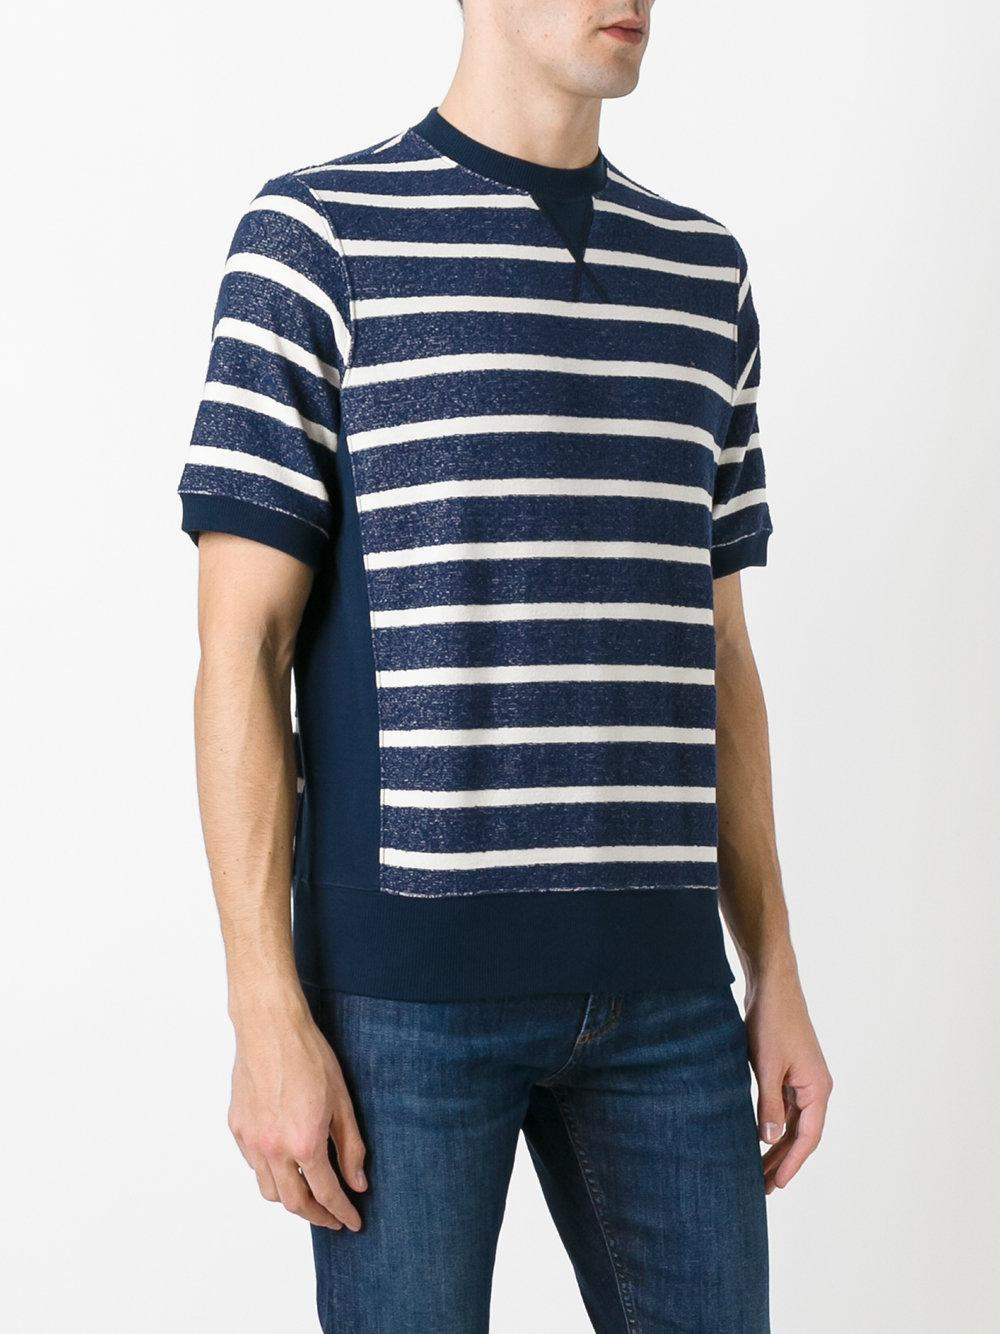 The gigi horizontal stripe sweater t shirt in blue for men for Horizontal striped dress shirts men